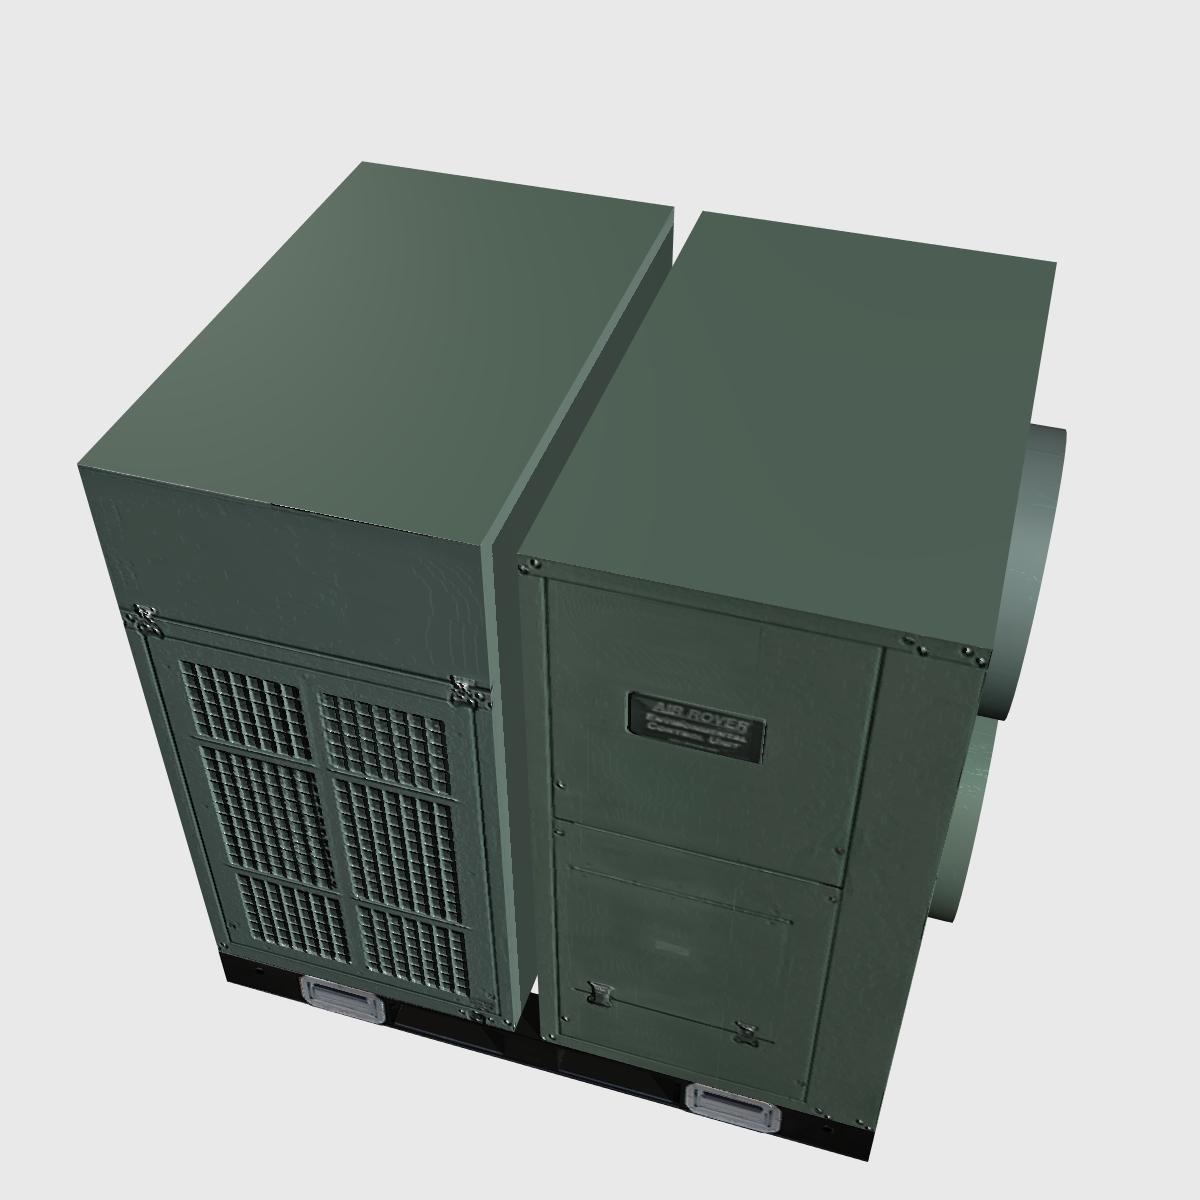 hvac air rover unit 3d model 3ds dxf cob x obj 153095